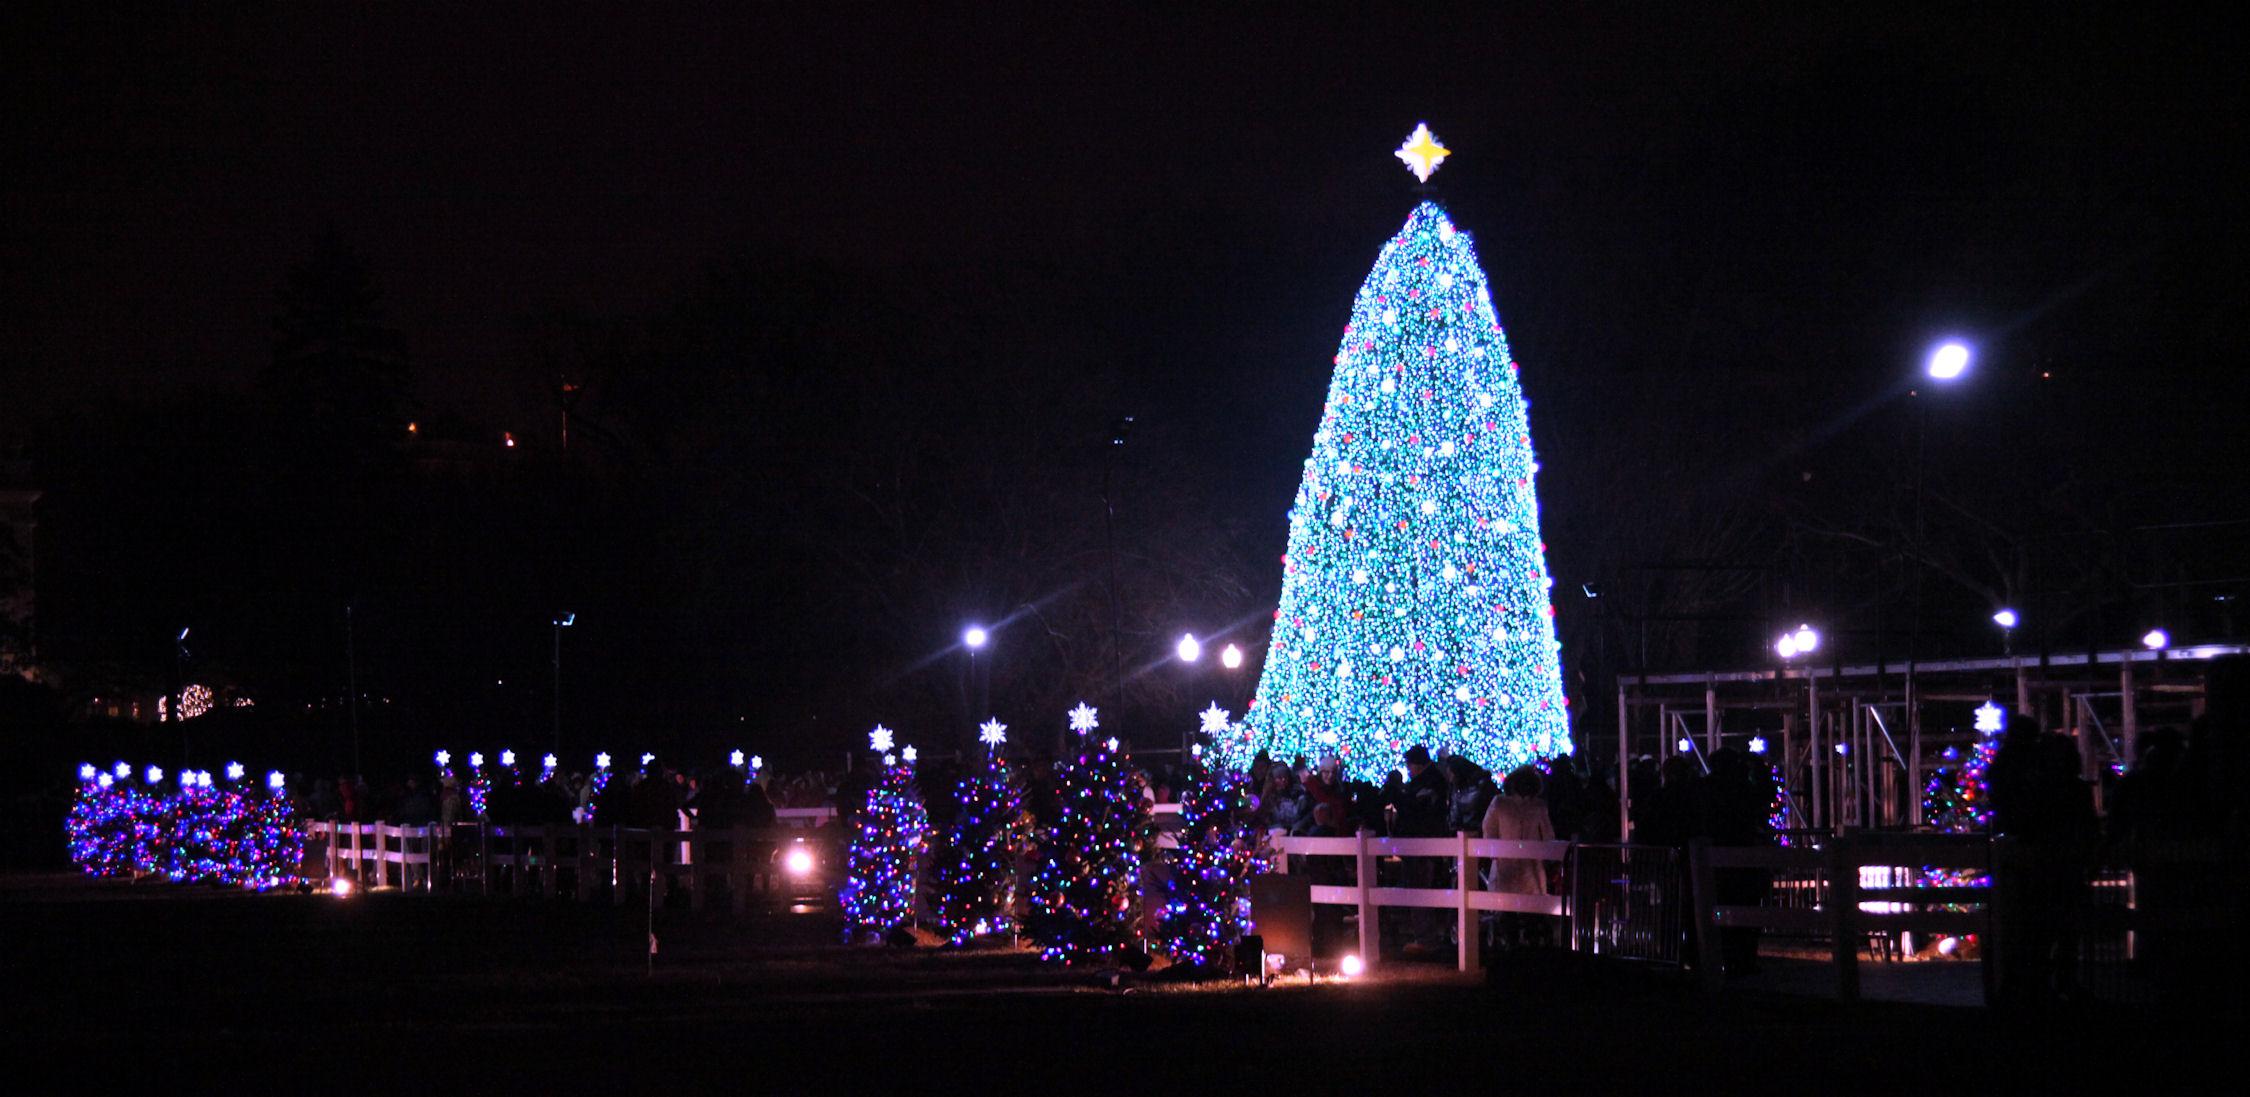 U.S. National Christmas Tree on December 19, 2010